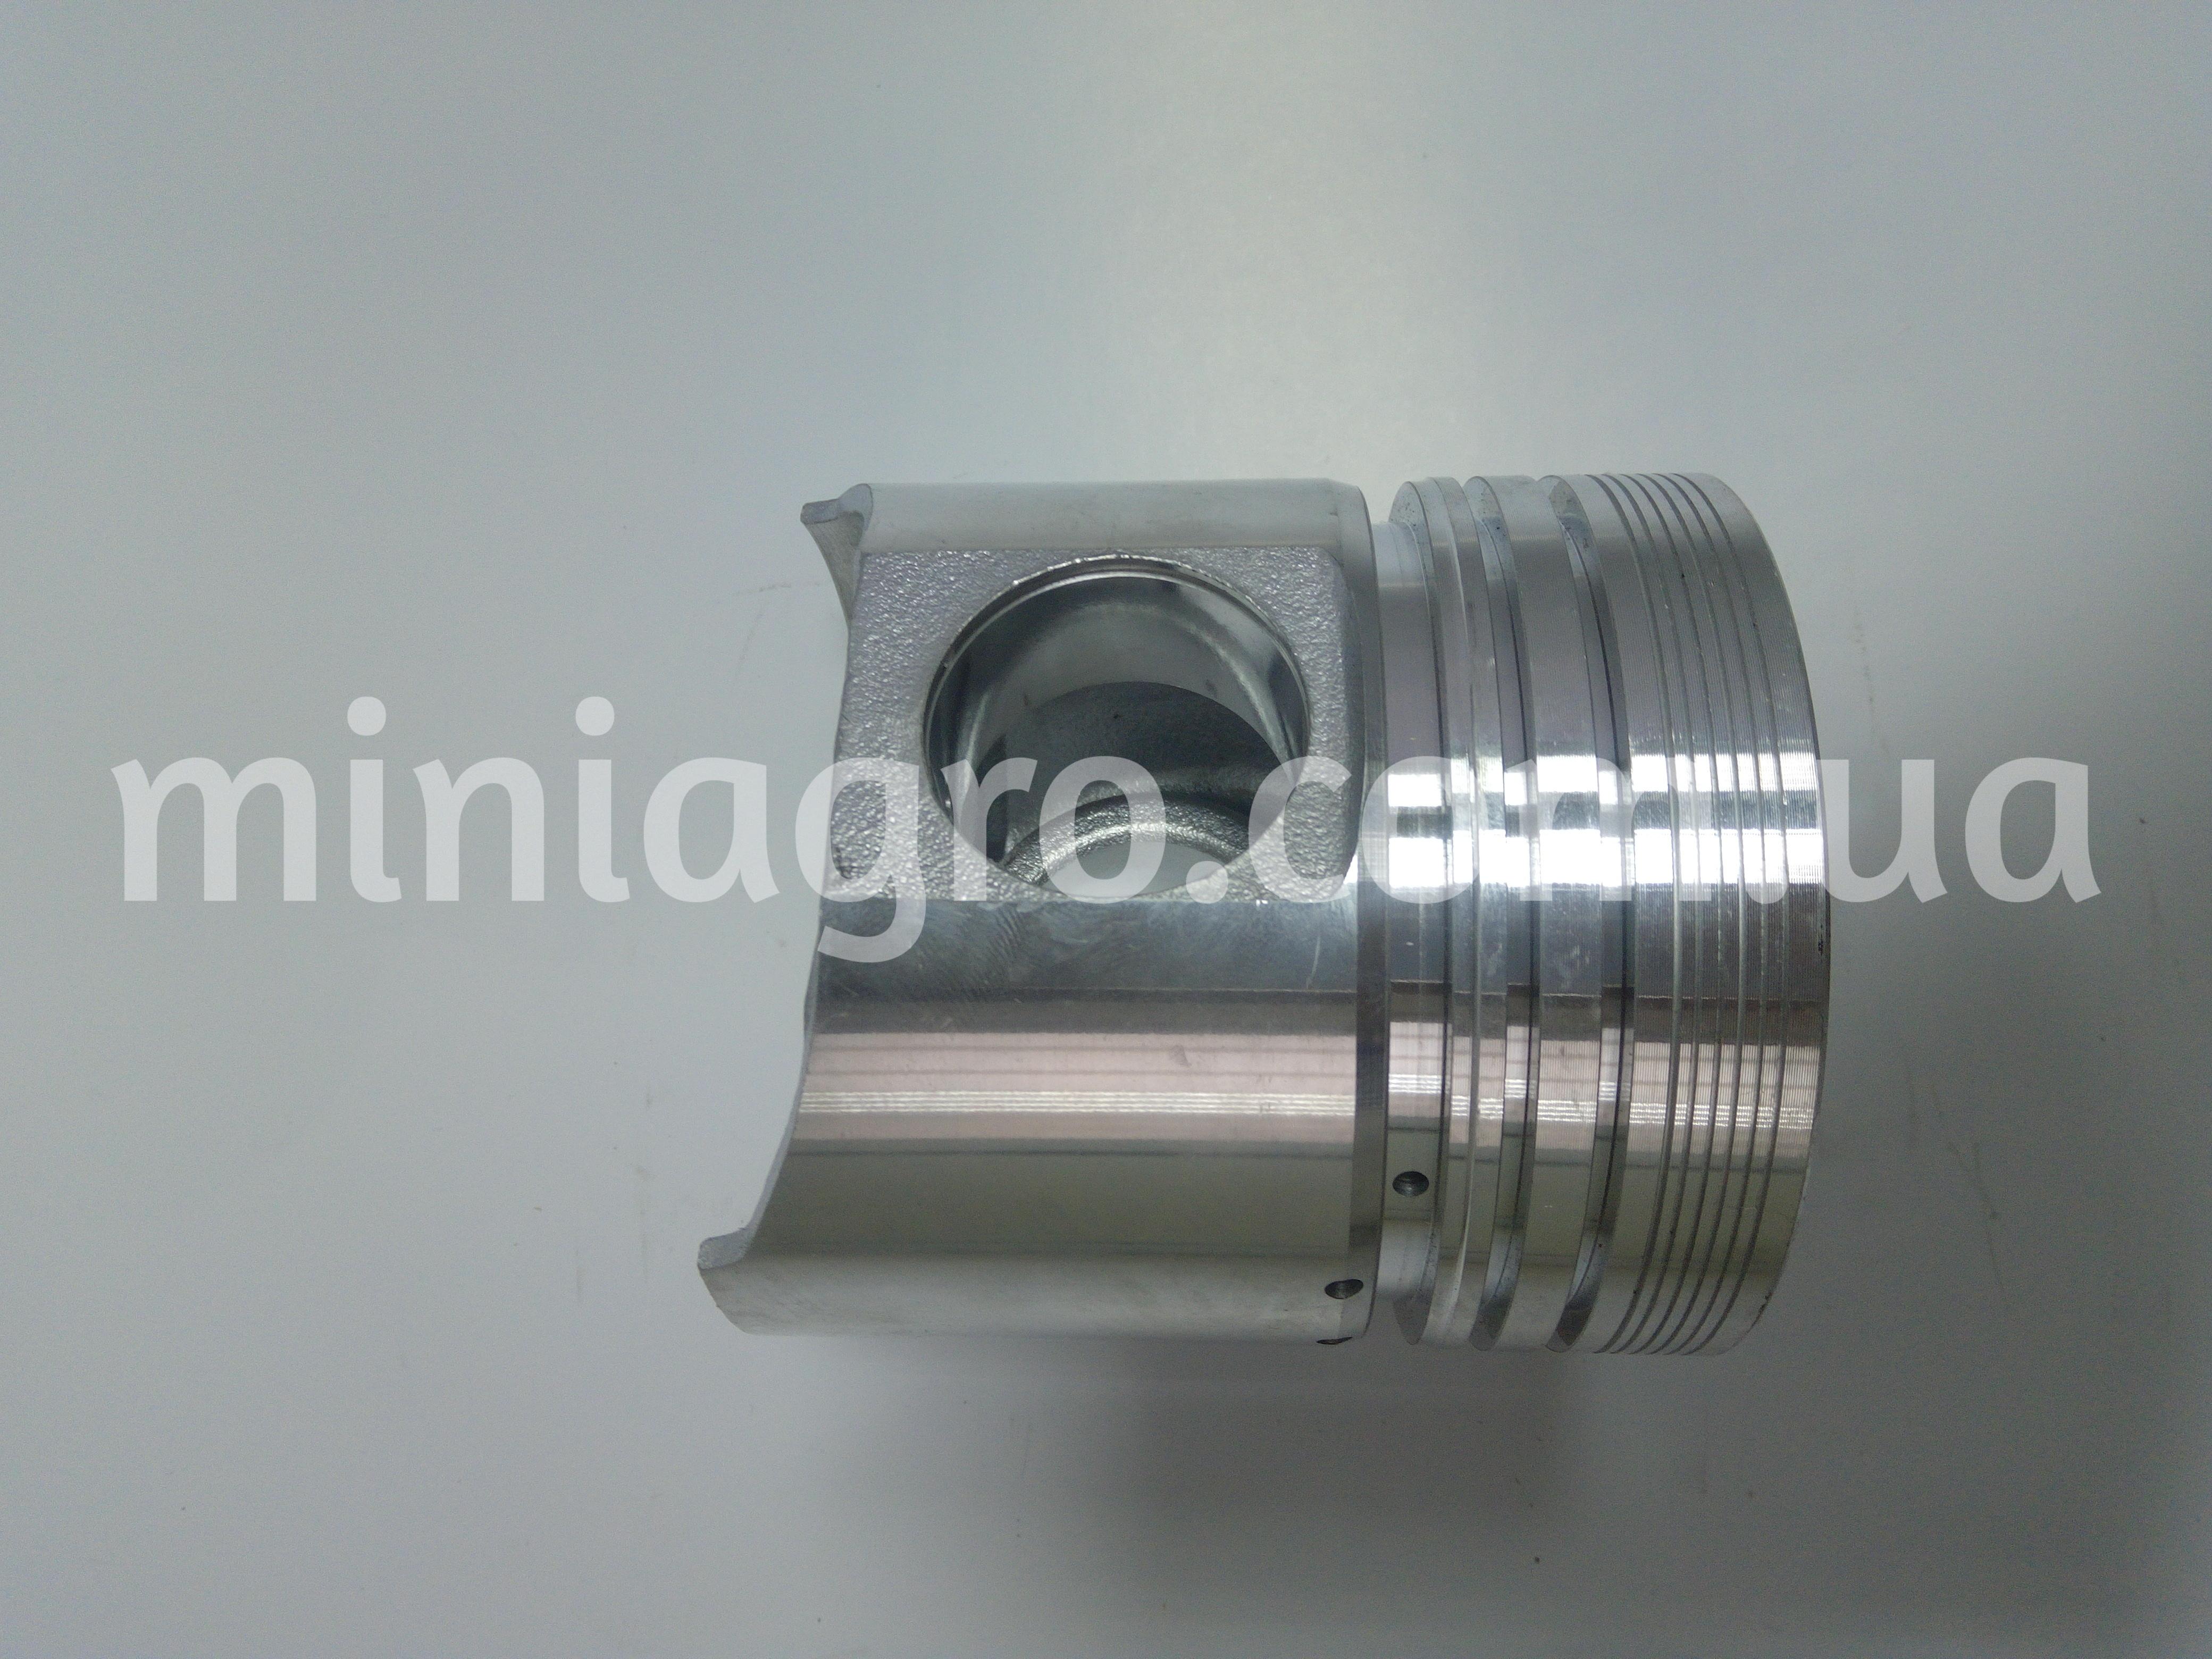 Поршень двигателя TY 295 для мини-трактора Xingtai 220